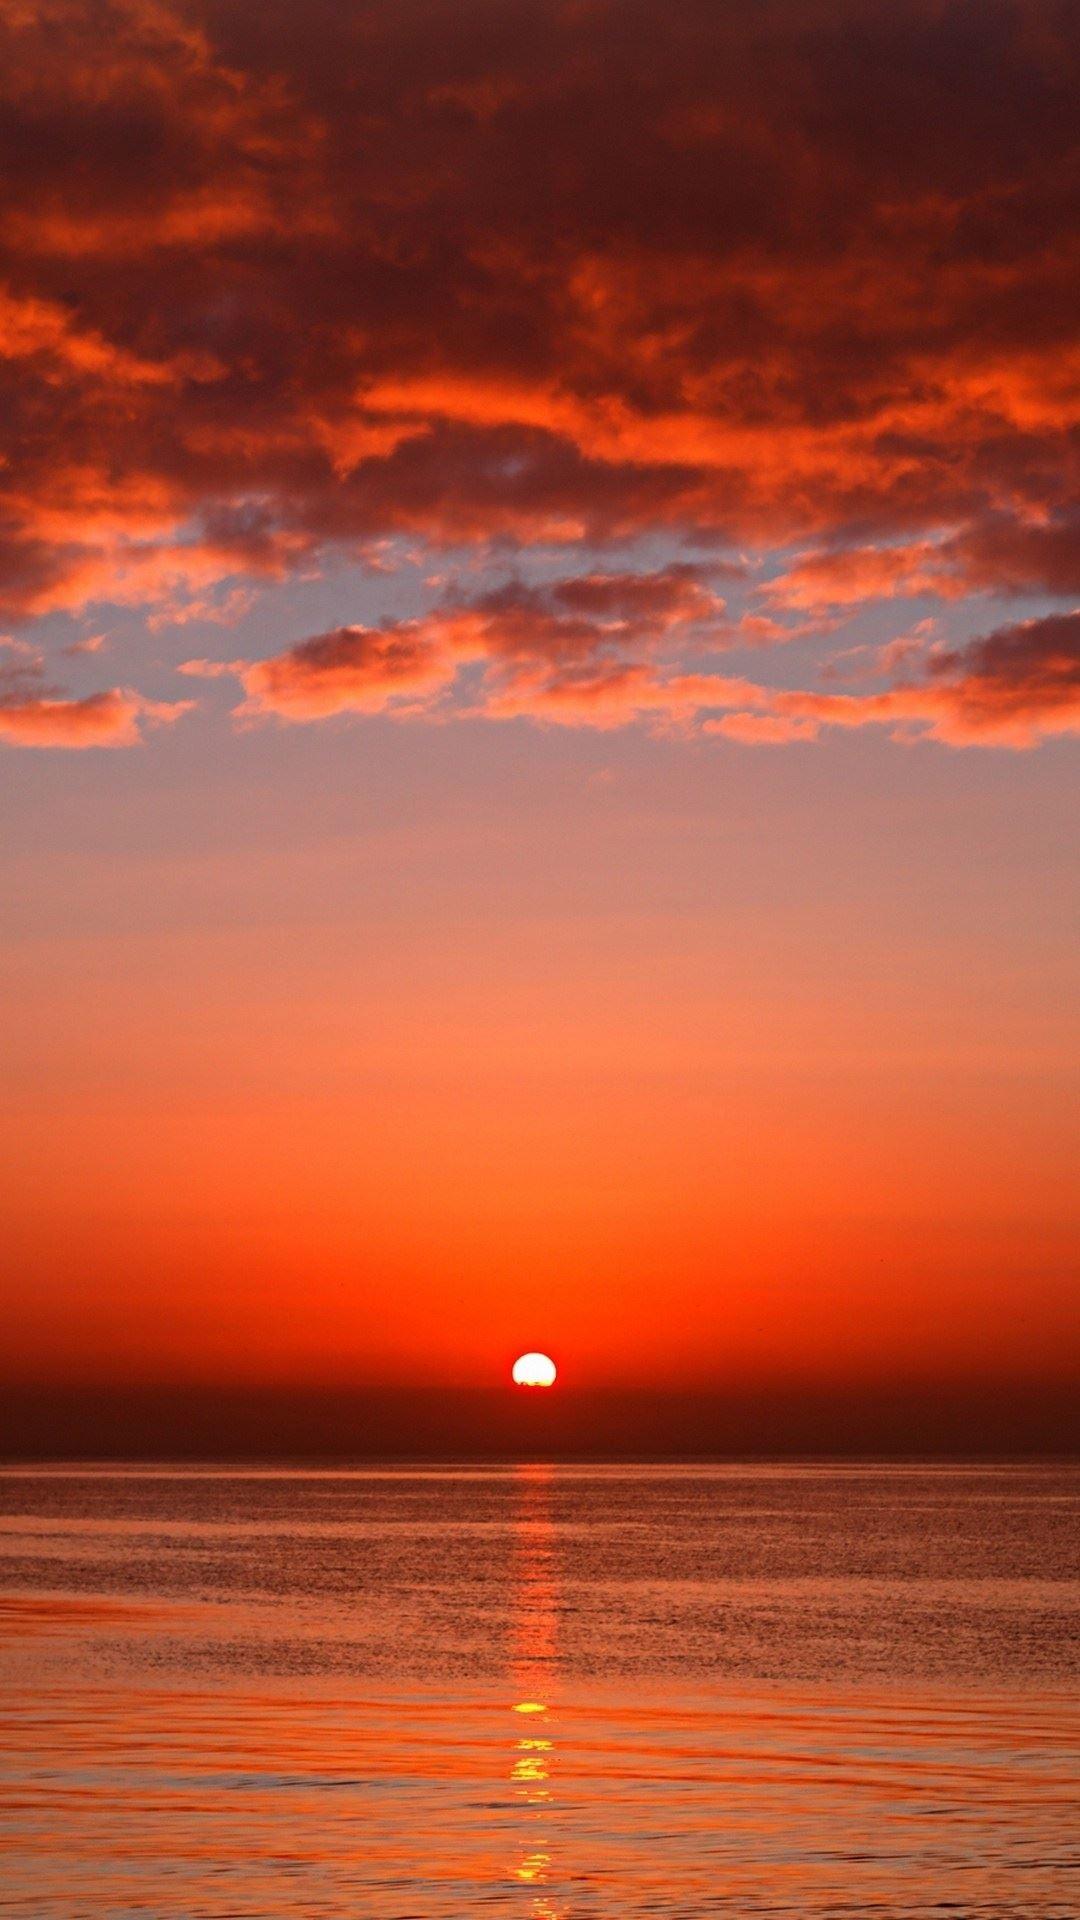 Bloody Red Ocean Sunset iPhone 6 Plus HD Wallpaper …